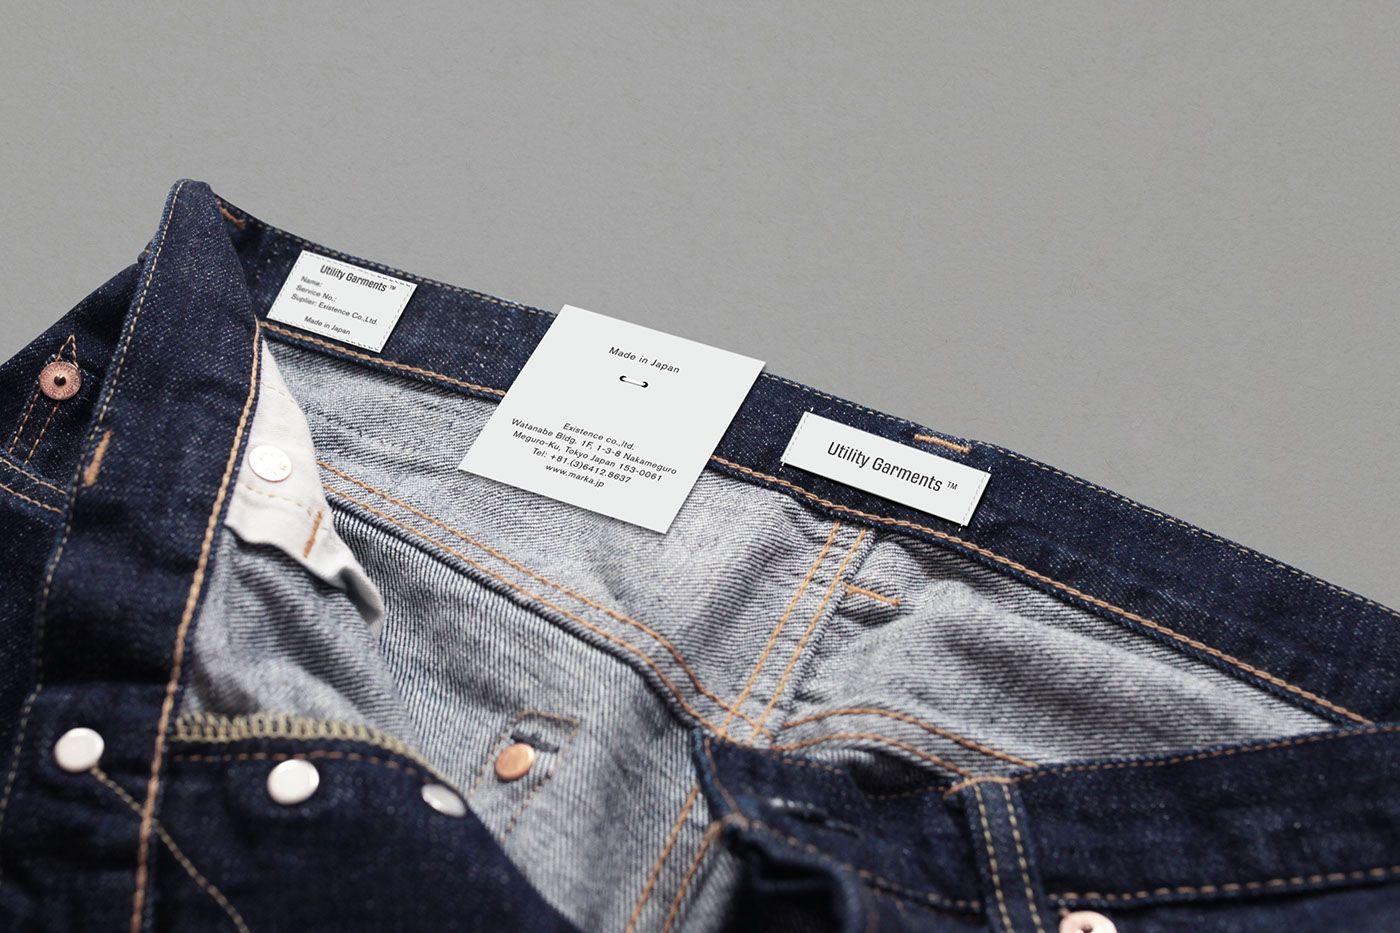 Utility Garments on Behance